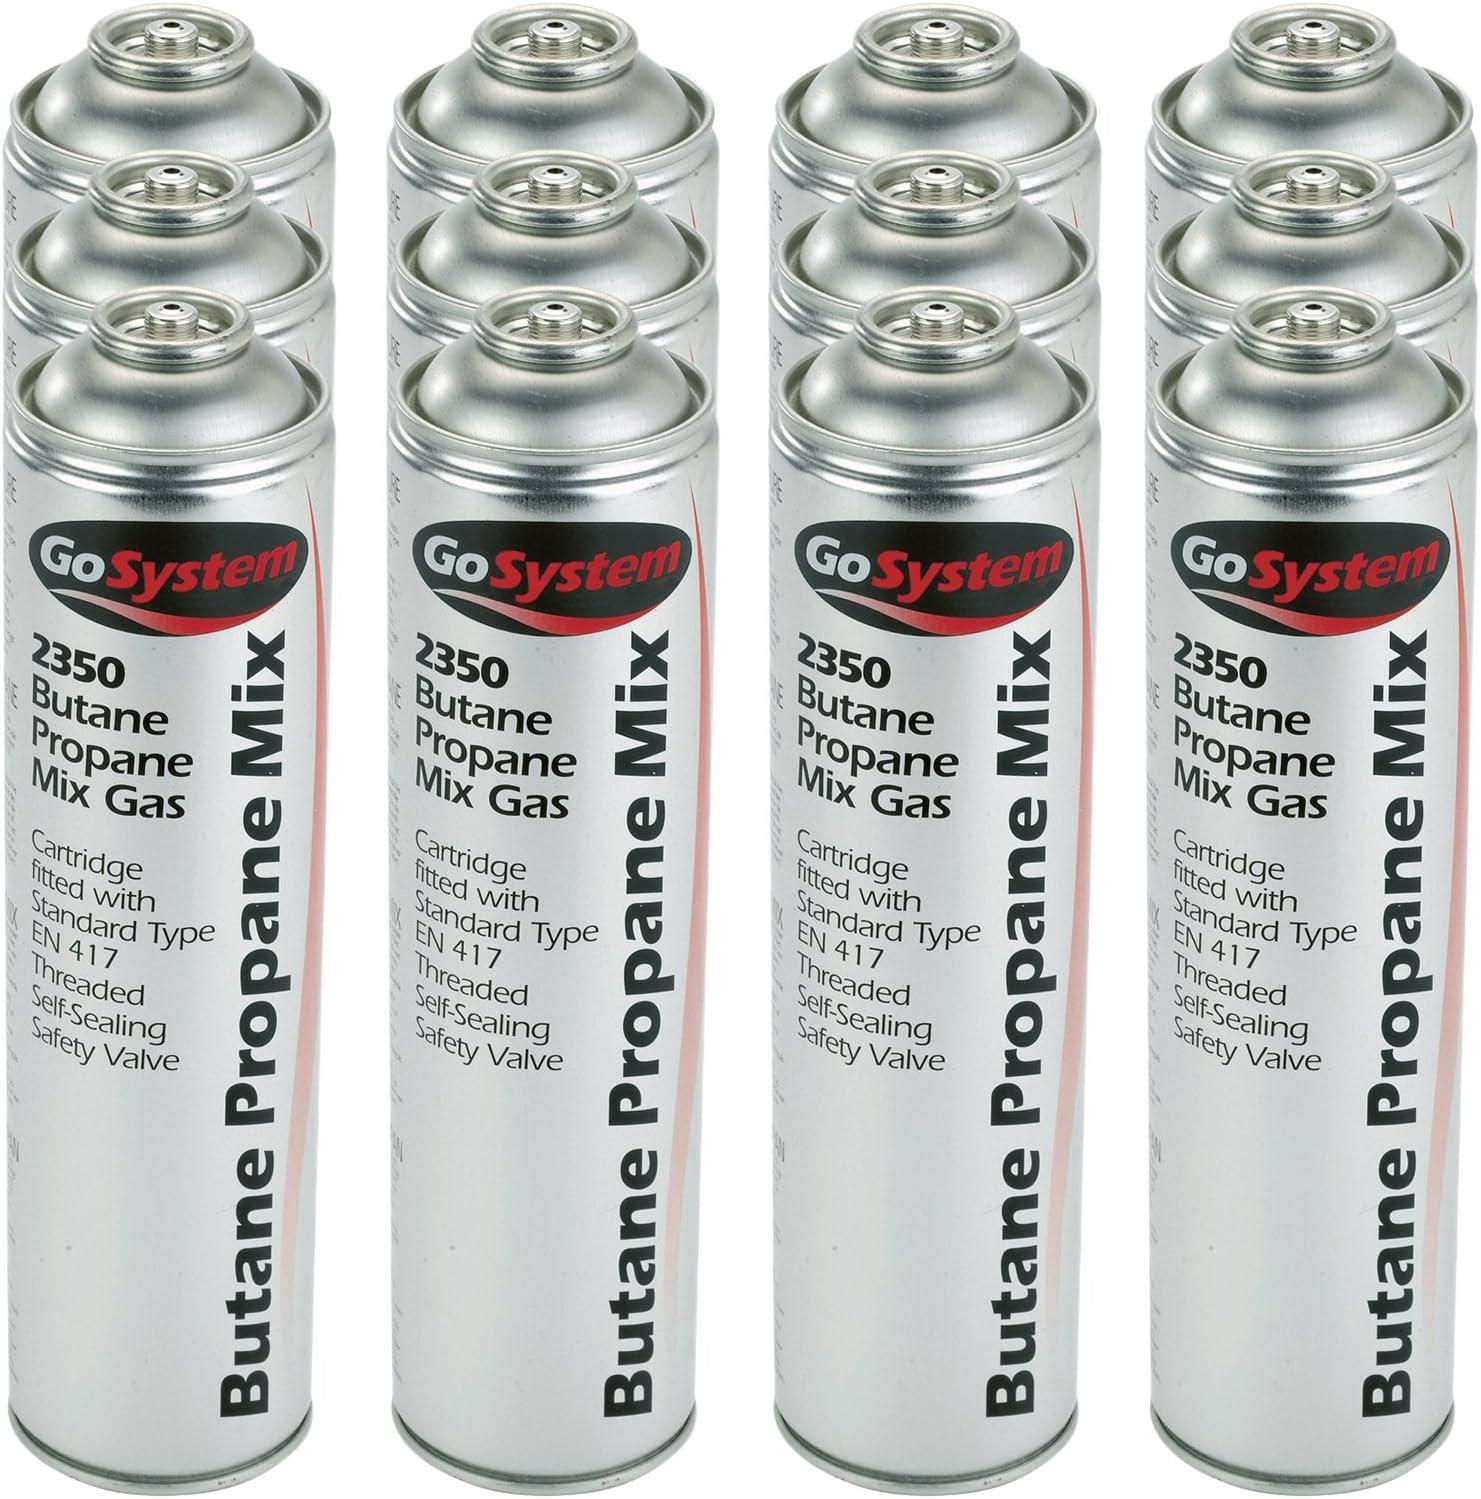 Butane Propane Gas Mix Cartridge Threaded Self Sealing Valve Go System Pack of 4